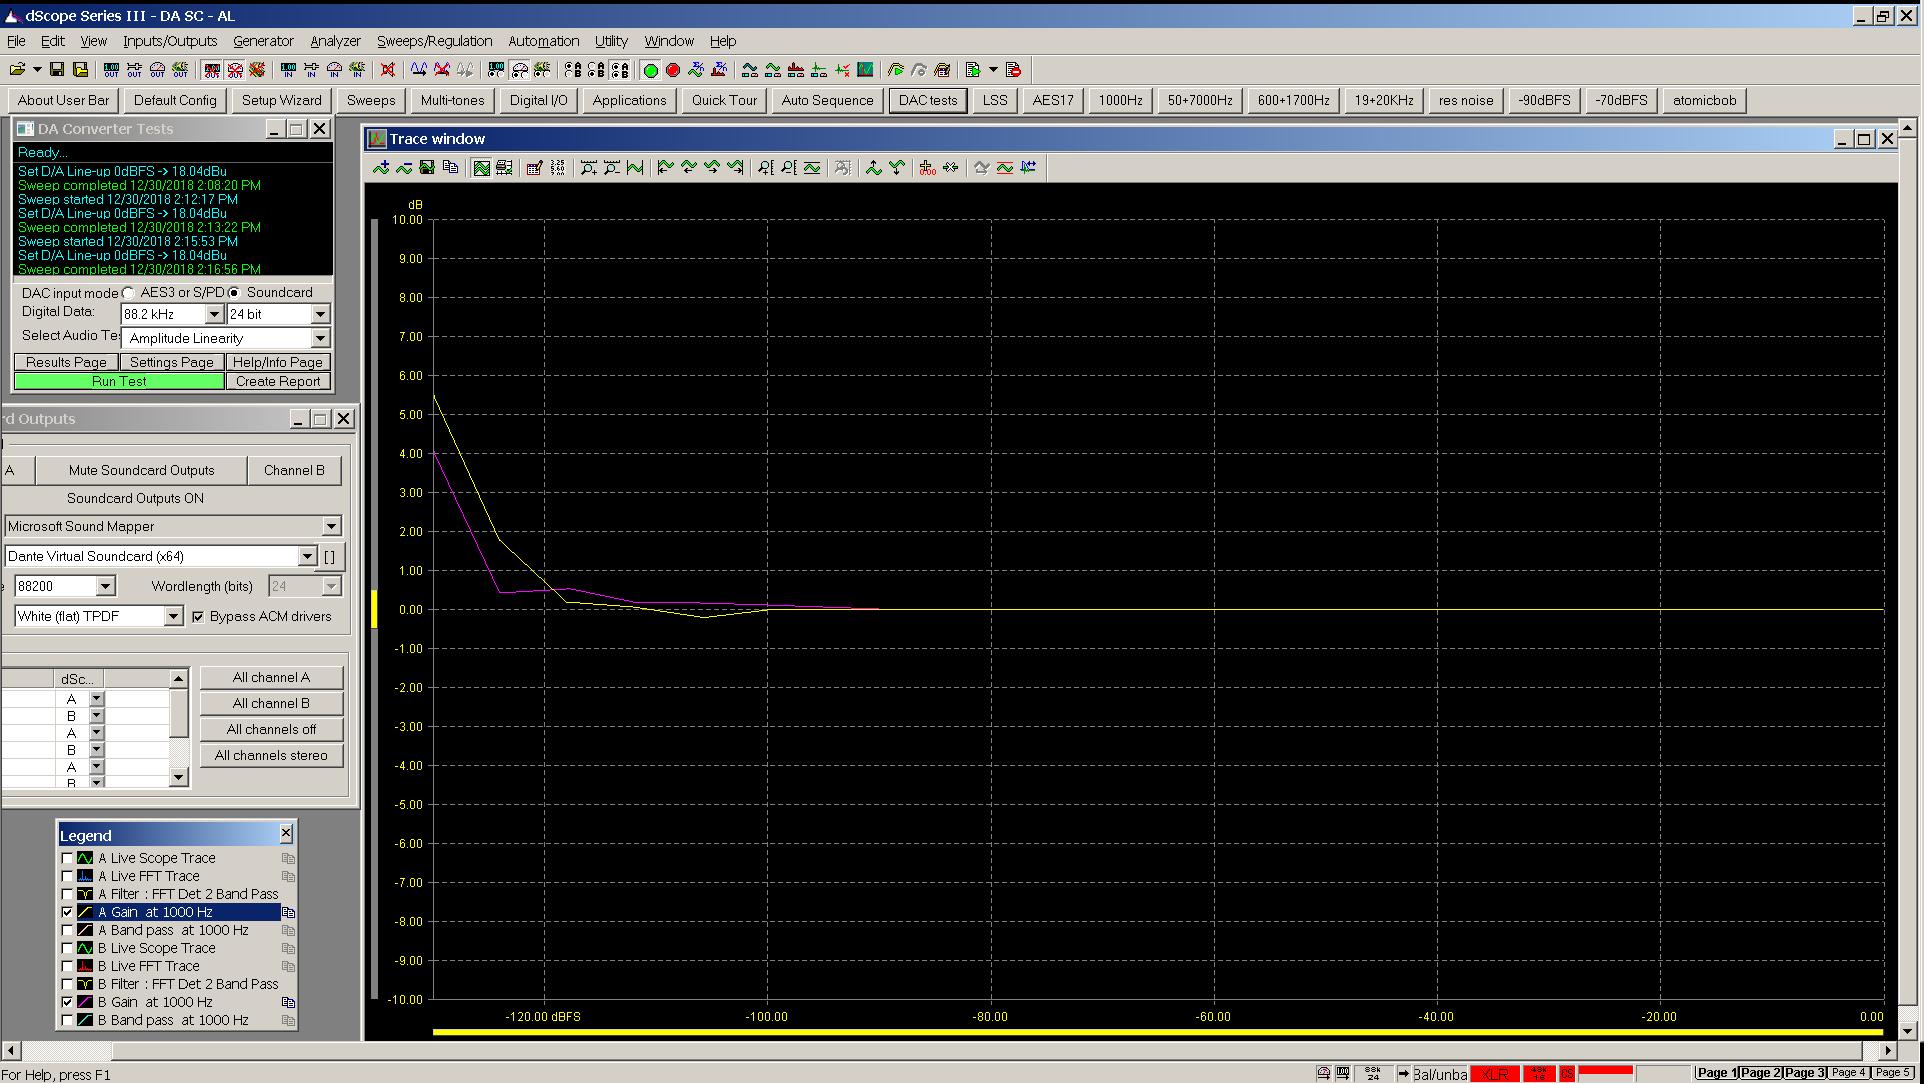 20181227-51 convert2 Bal 1 KHz gain linearity - AES - Dante VSC - 88K ext clk t2.PNG